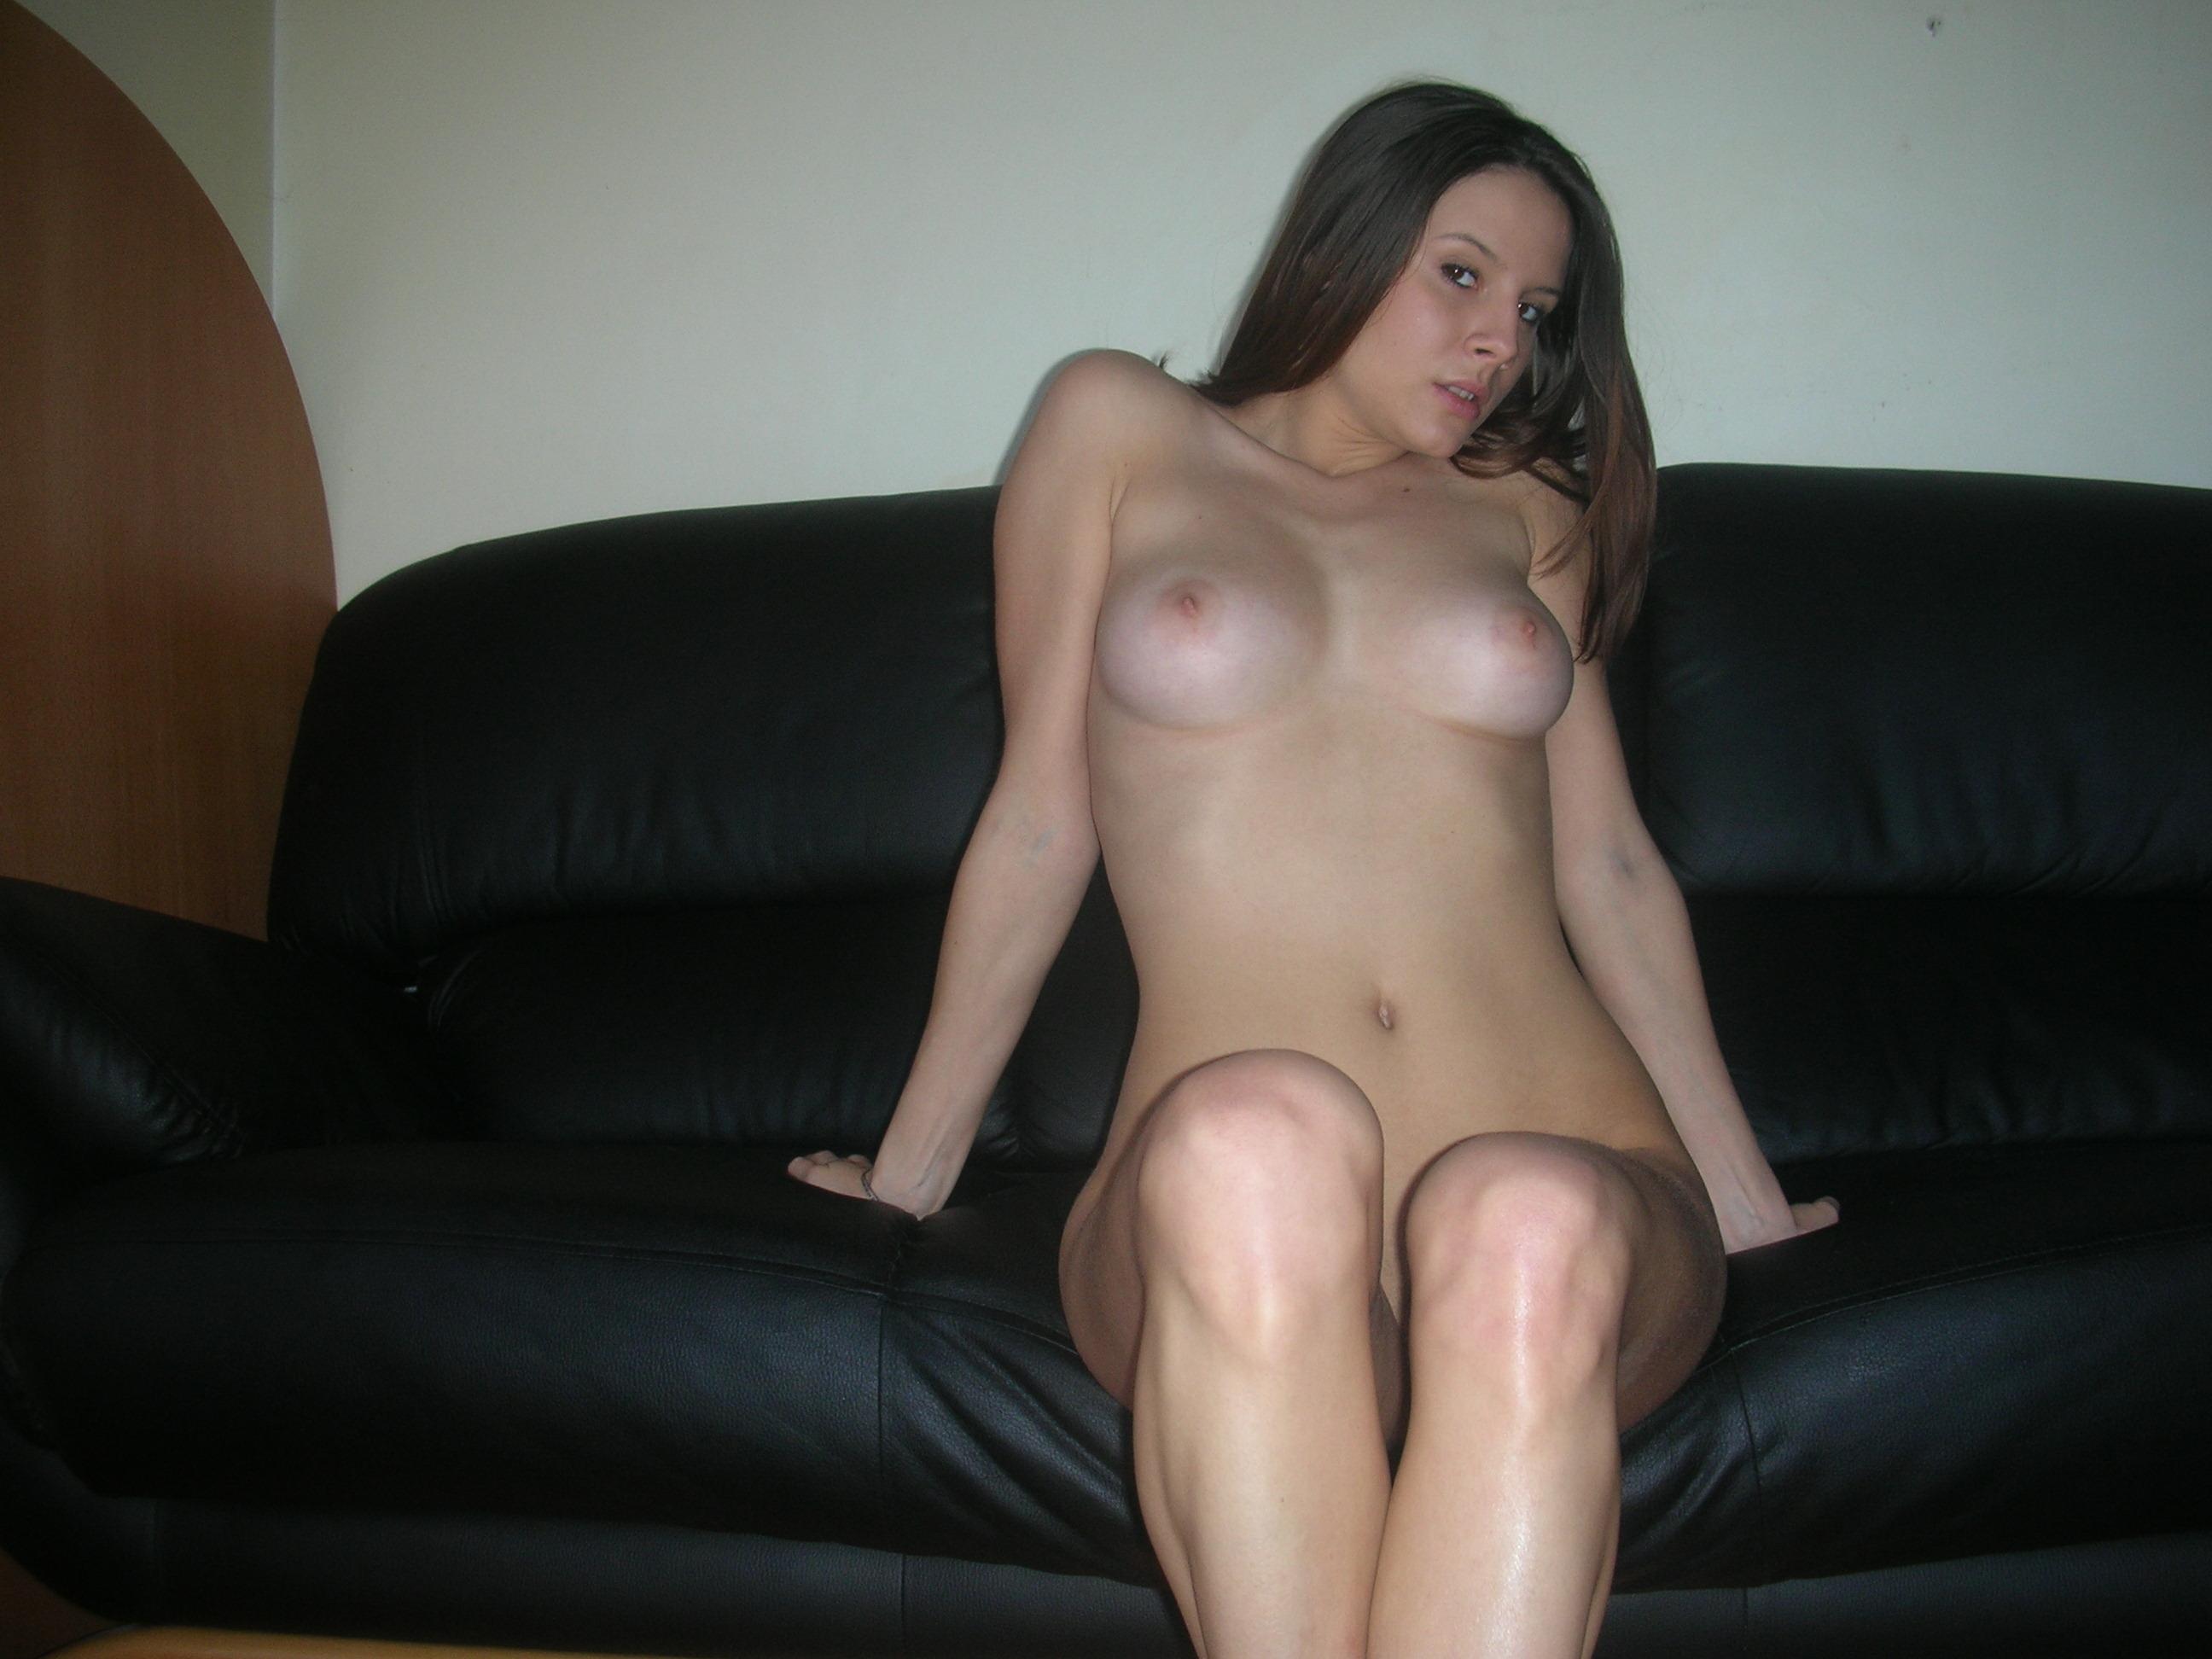 Big boob girls boxing topless